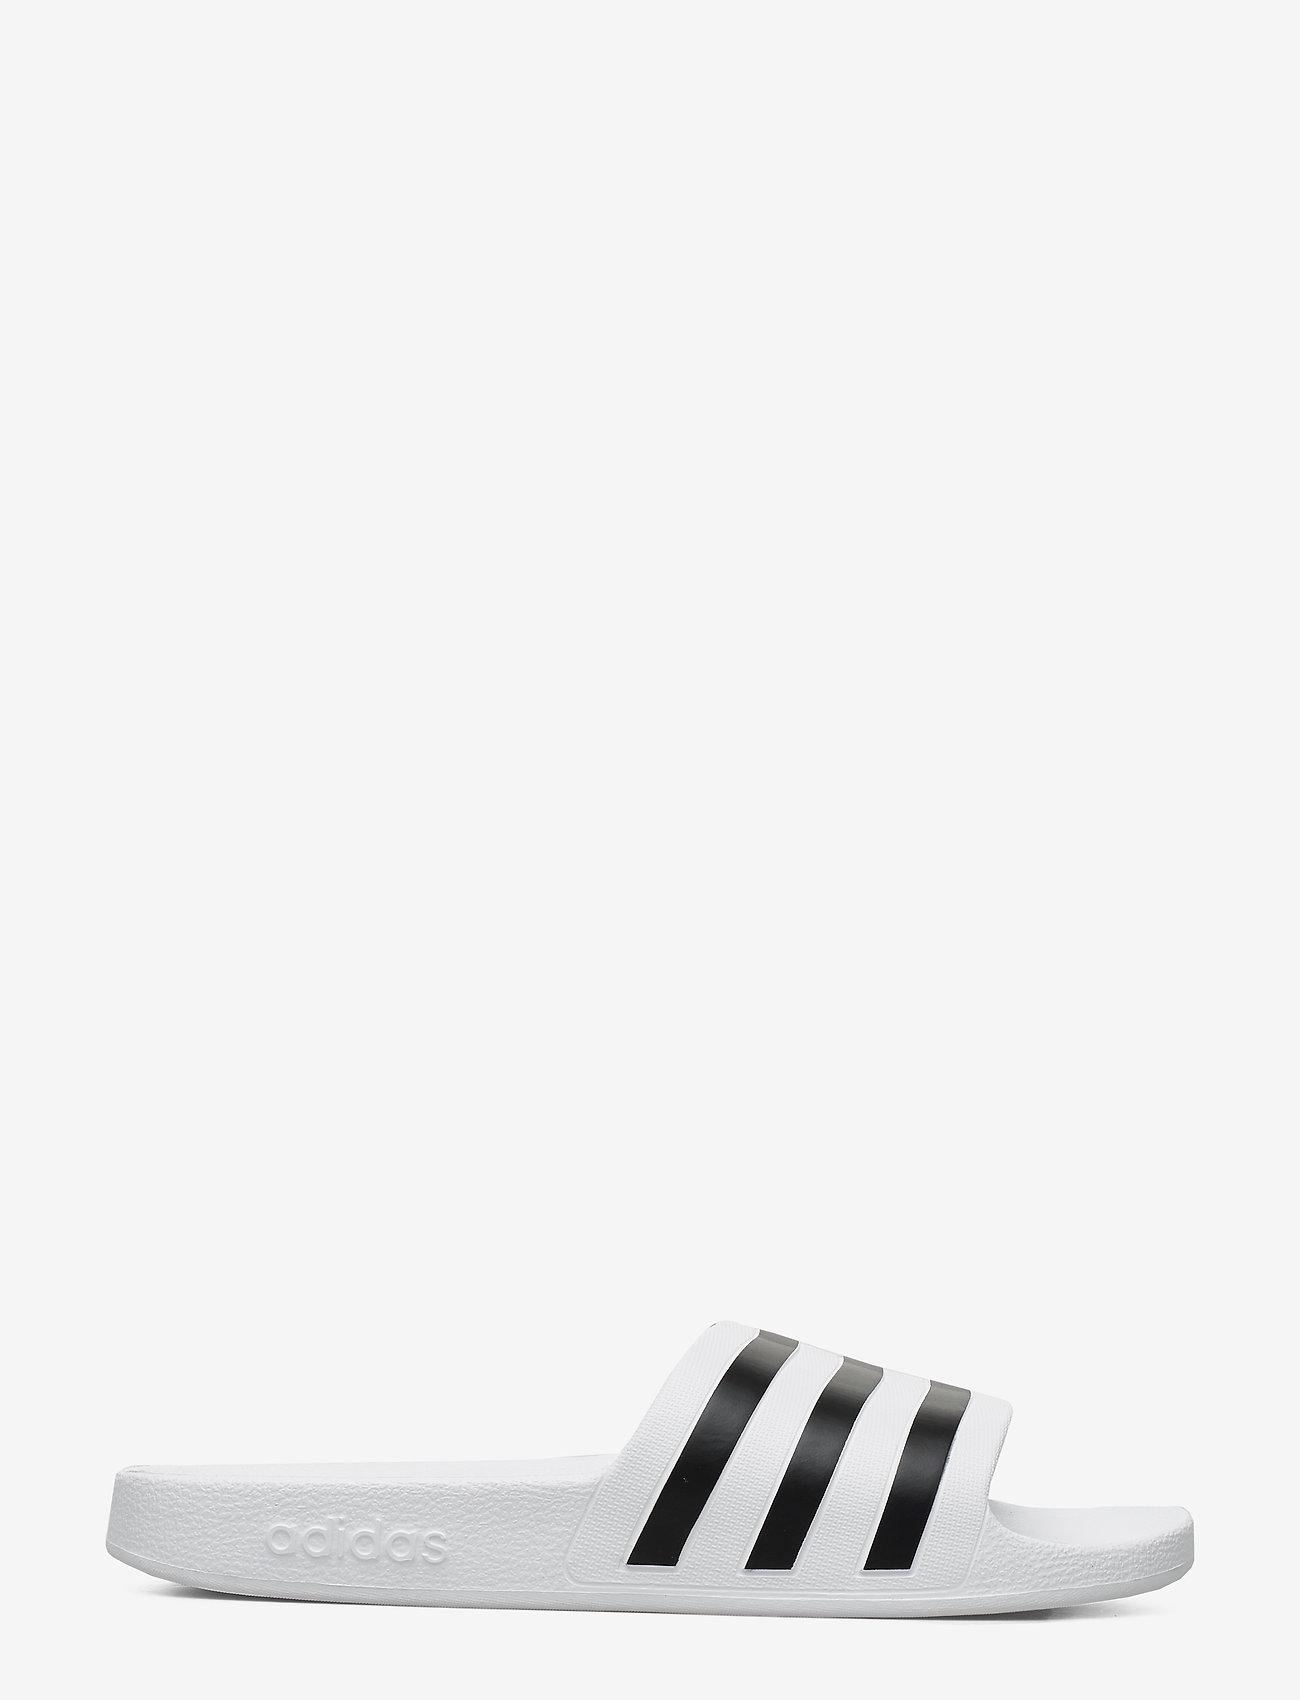 adidas Performance - ADILETTE AQUA - curseurs de piscine - ftwwht/cblack/ftwwht - 1